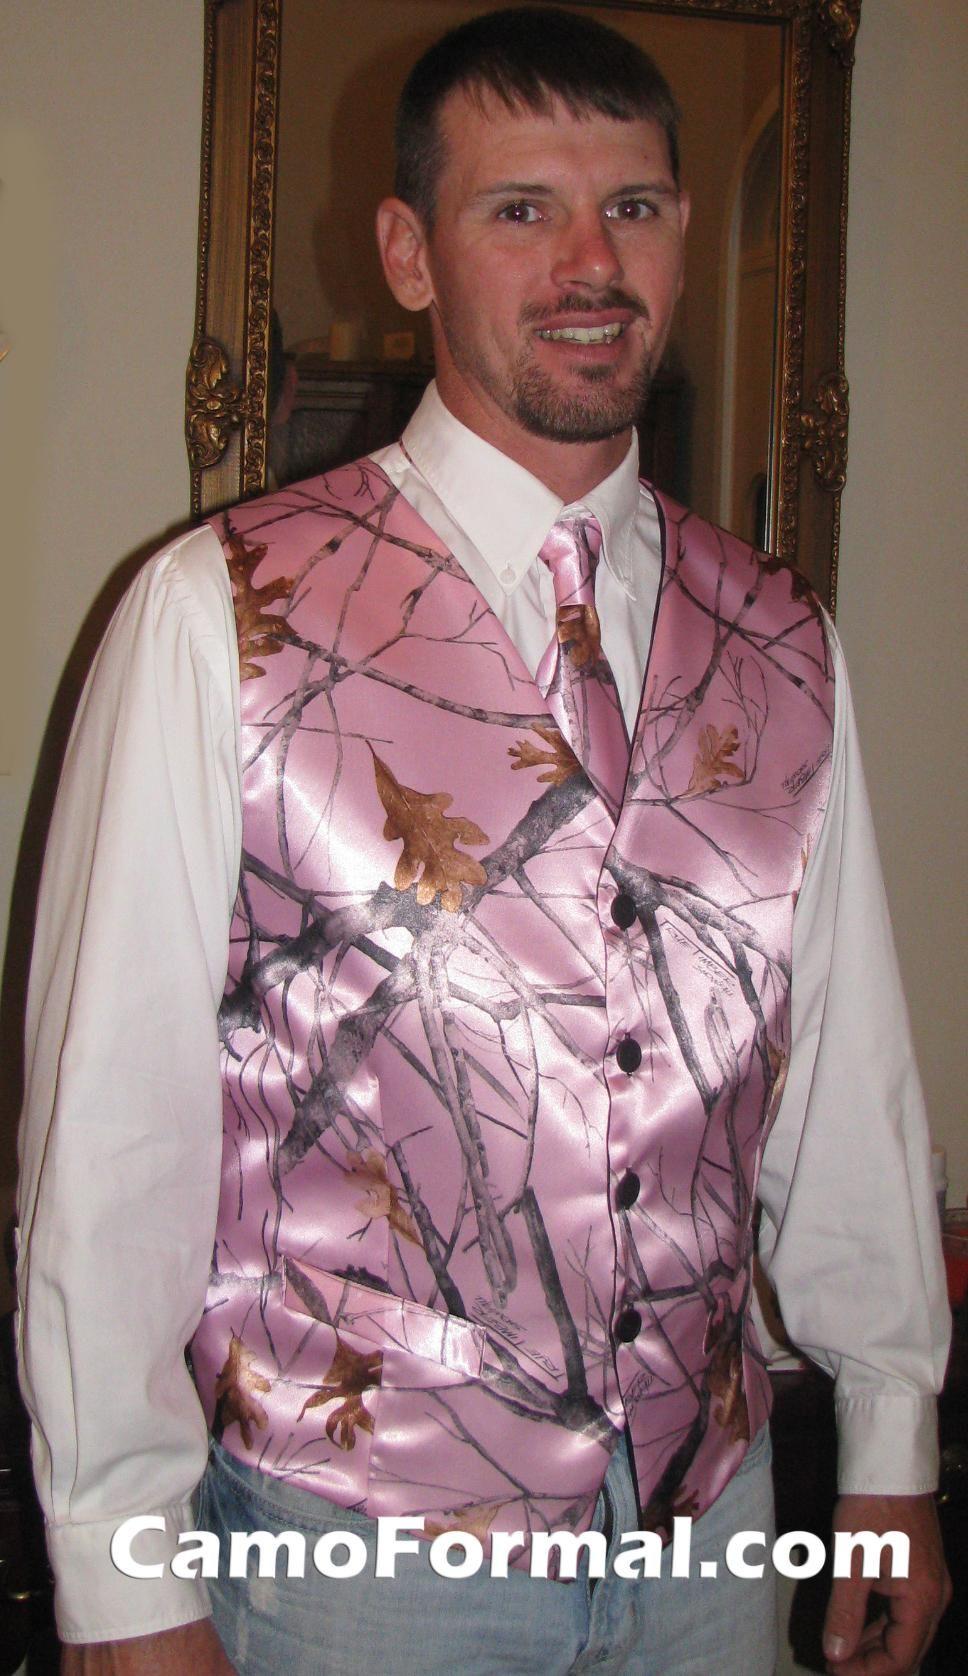 Camo wedding help wedding dresses ideas weddings camo formal mens vest pink snowfall best